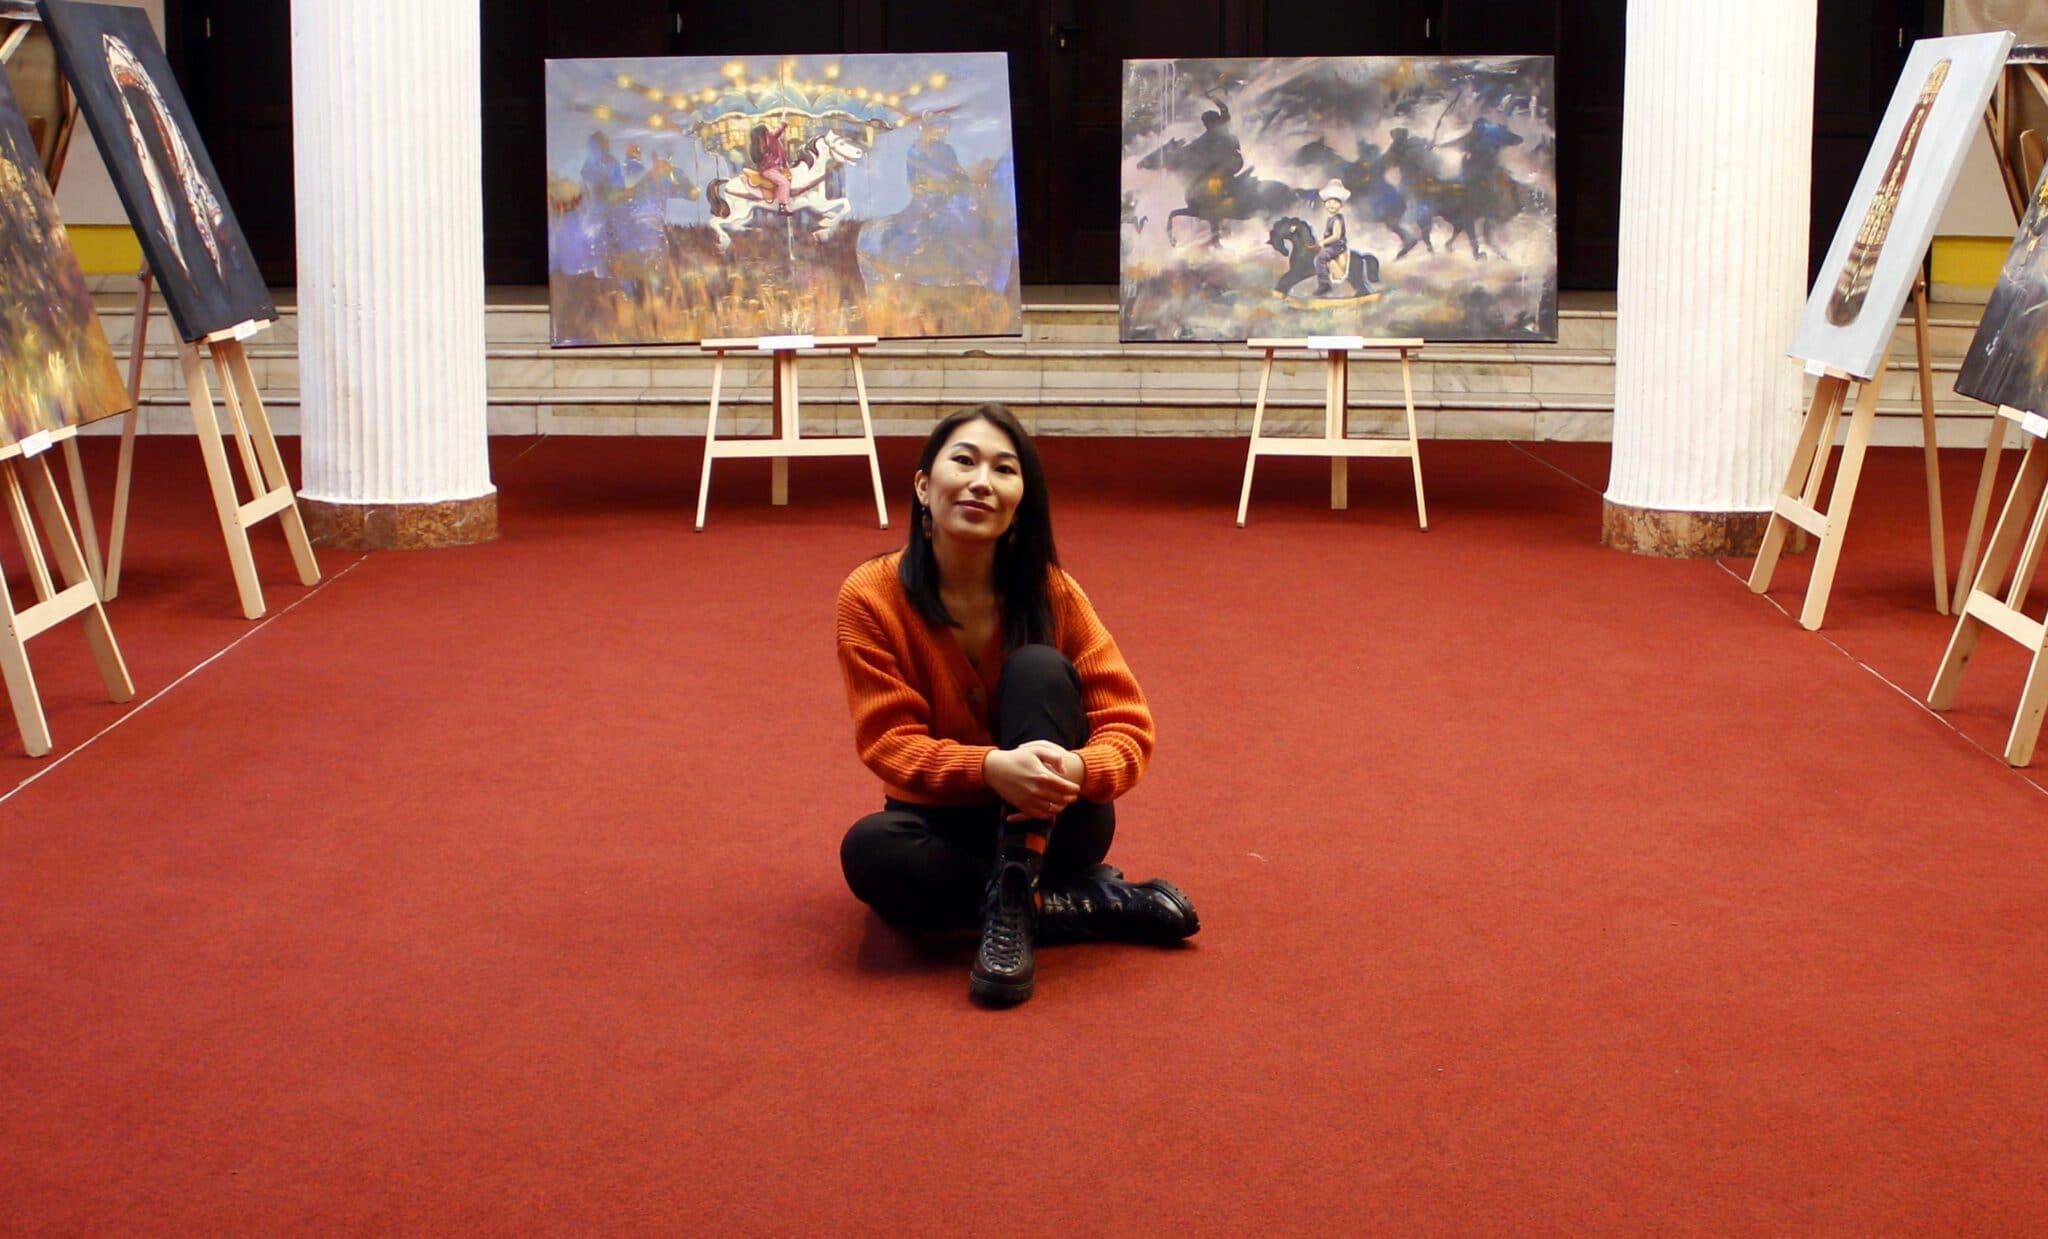 Info Shymkent - Kazakh Artist Alua Tebenova in her art exhibition